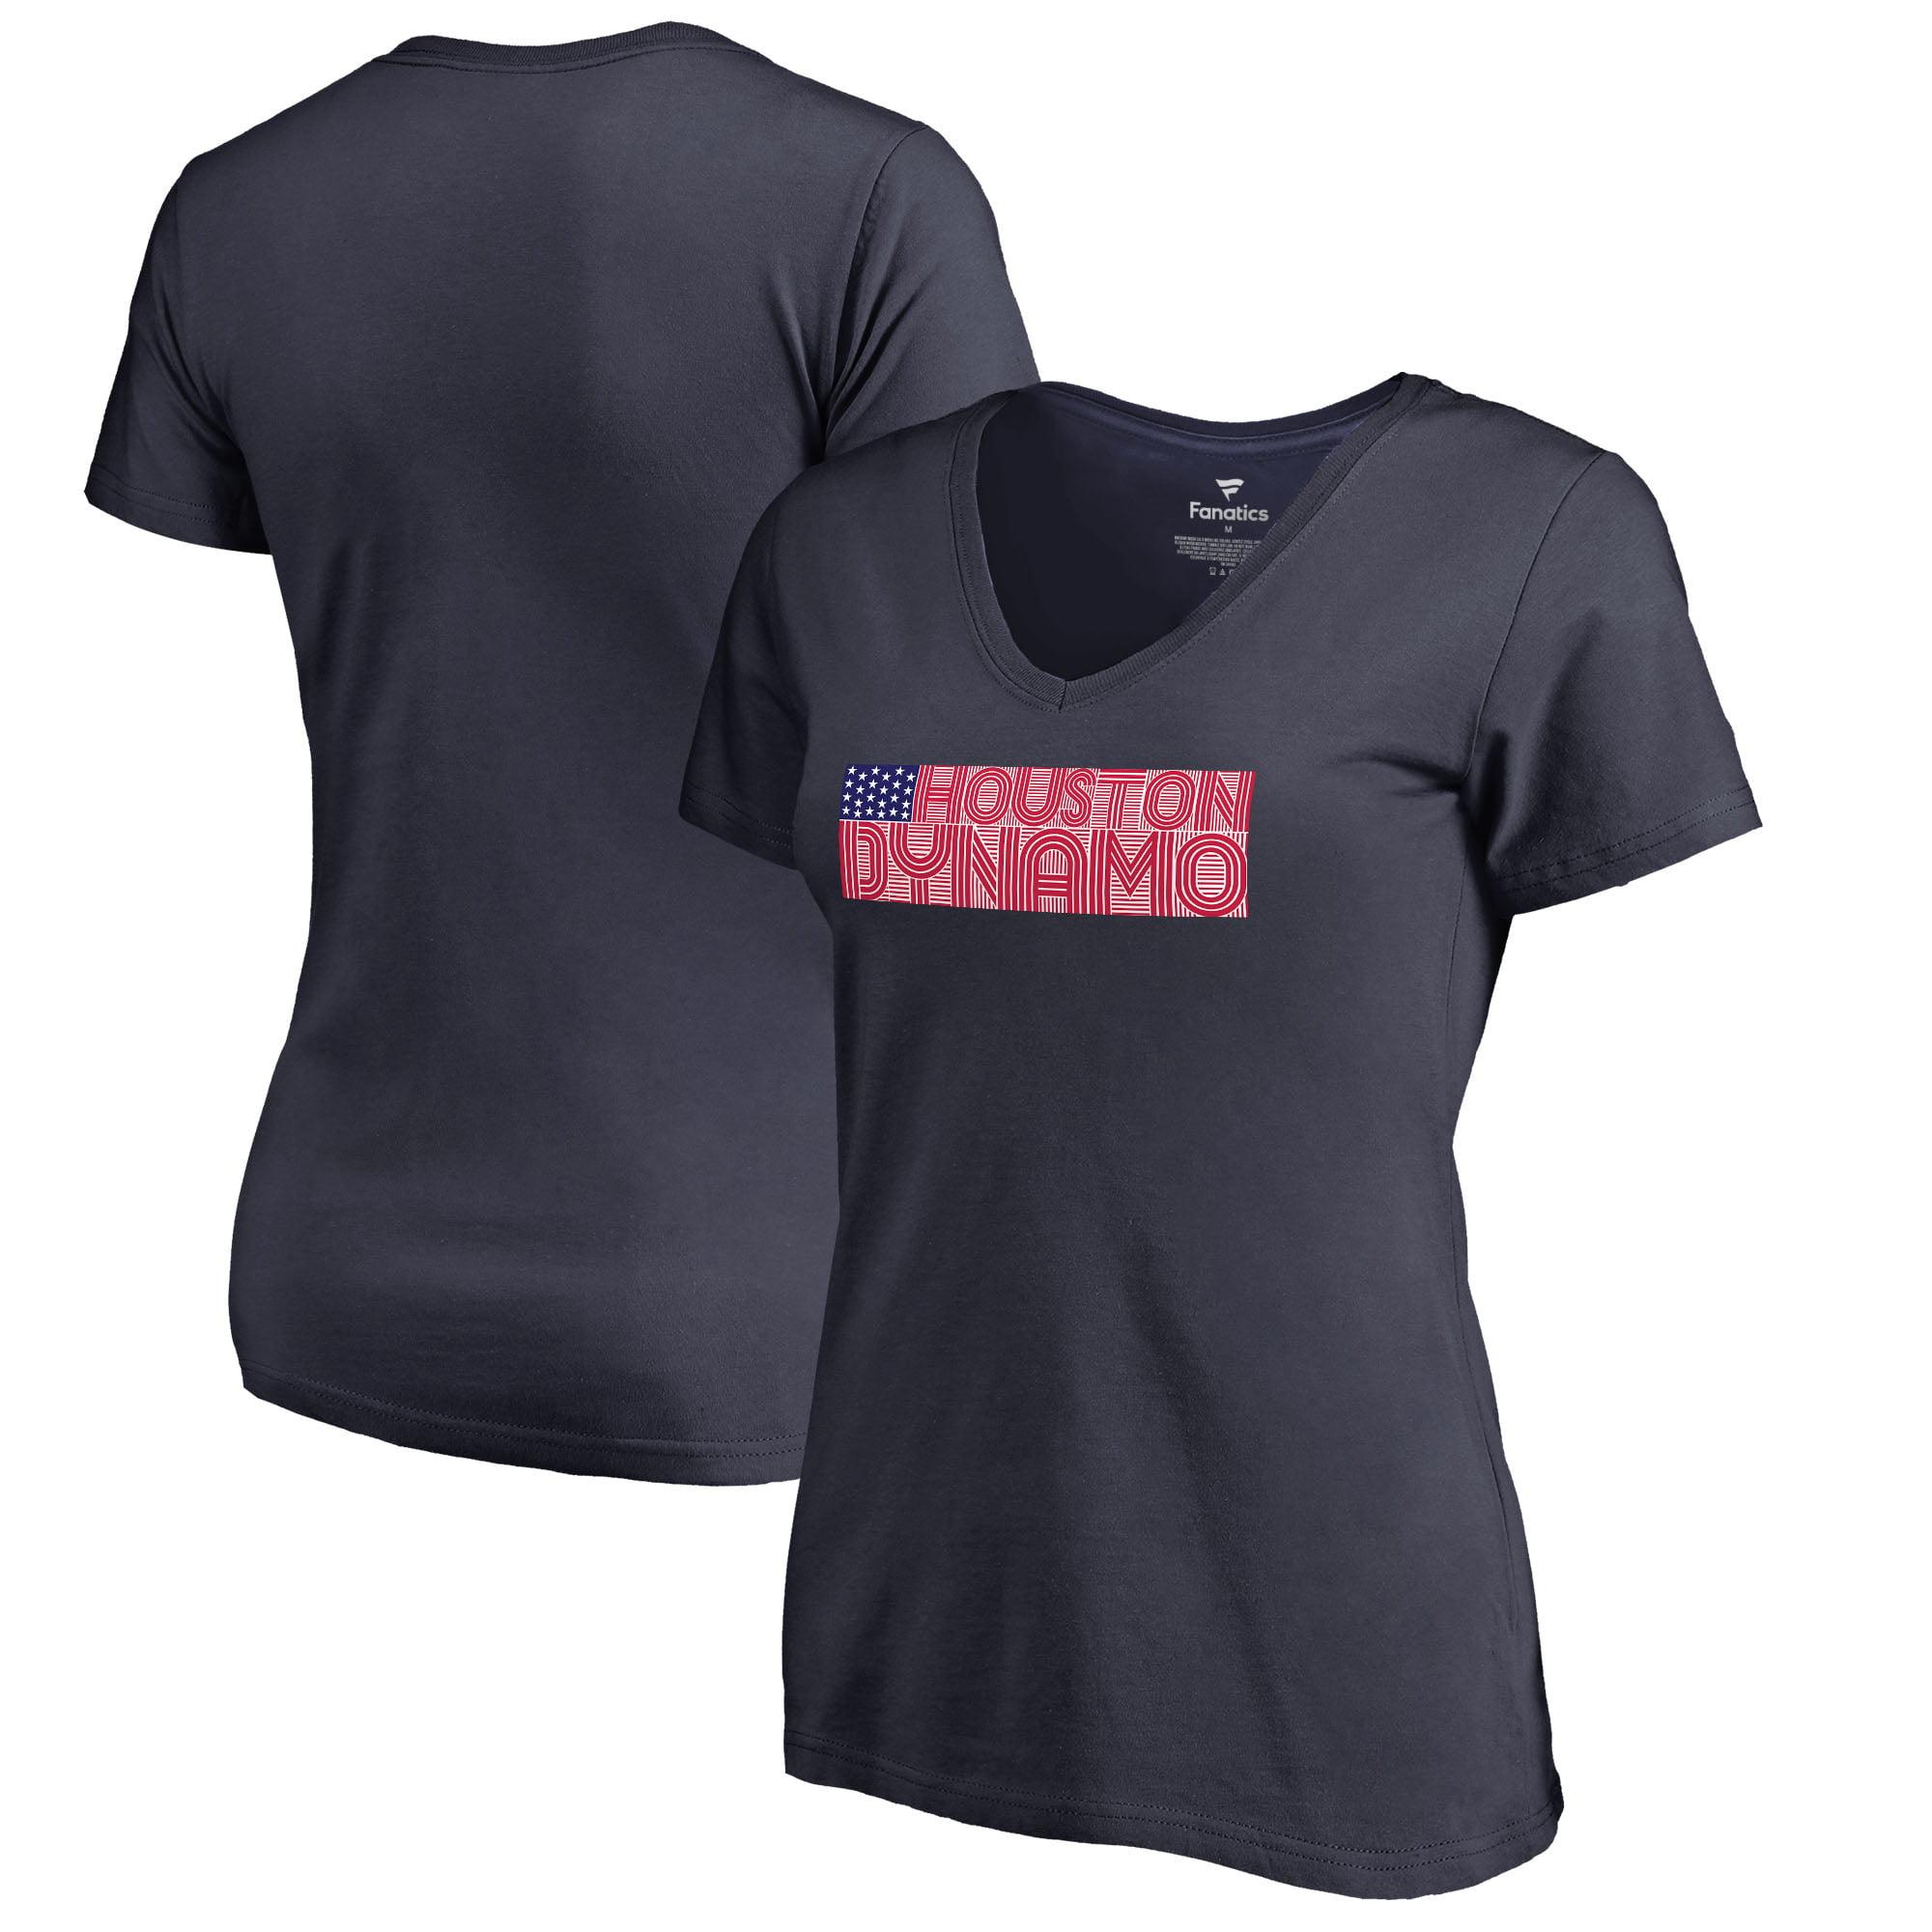 Houston Dynamo Fanatics Branded Women's Patriotic Wordmark V-Neck T-Shirt - Navy